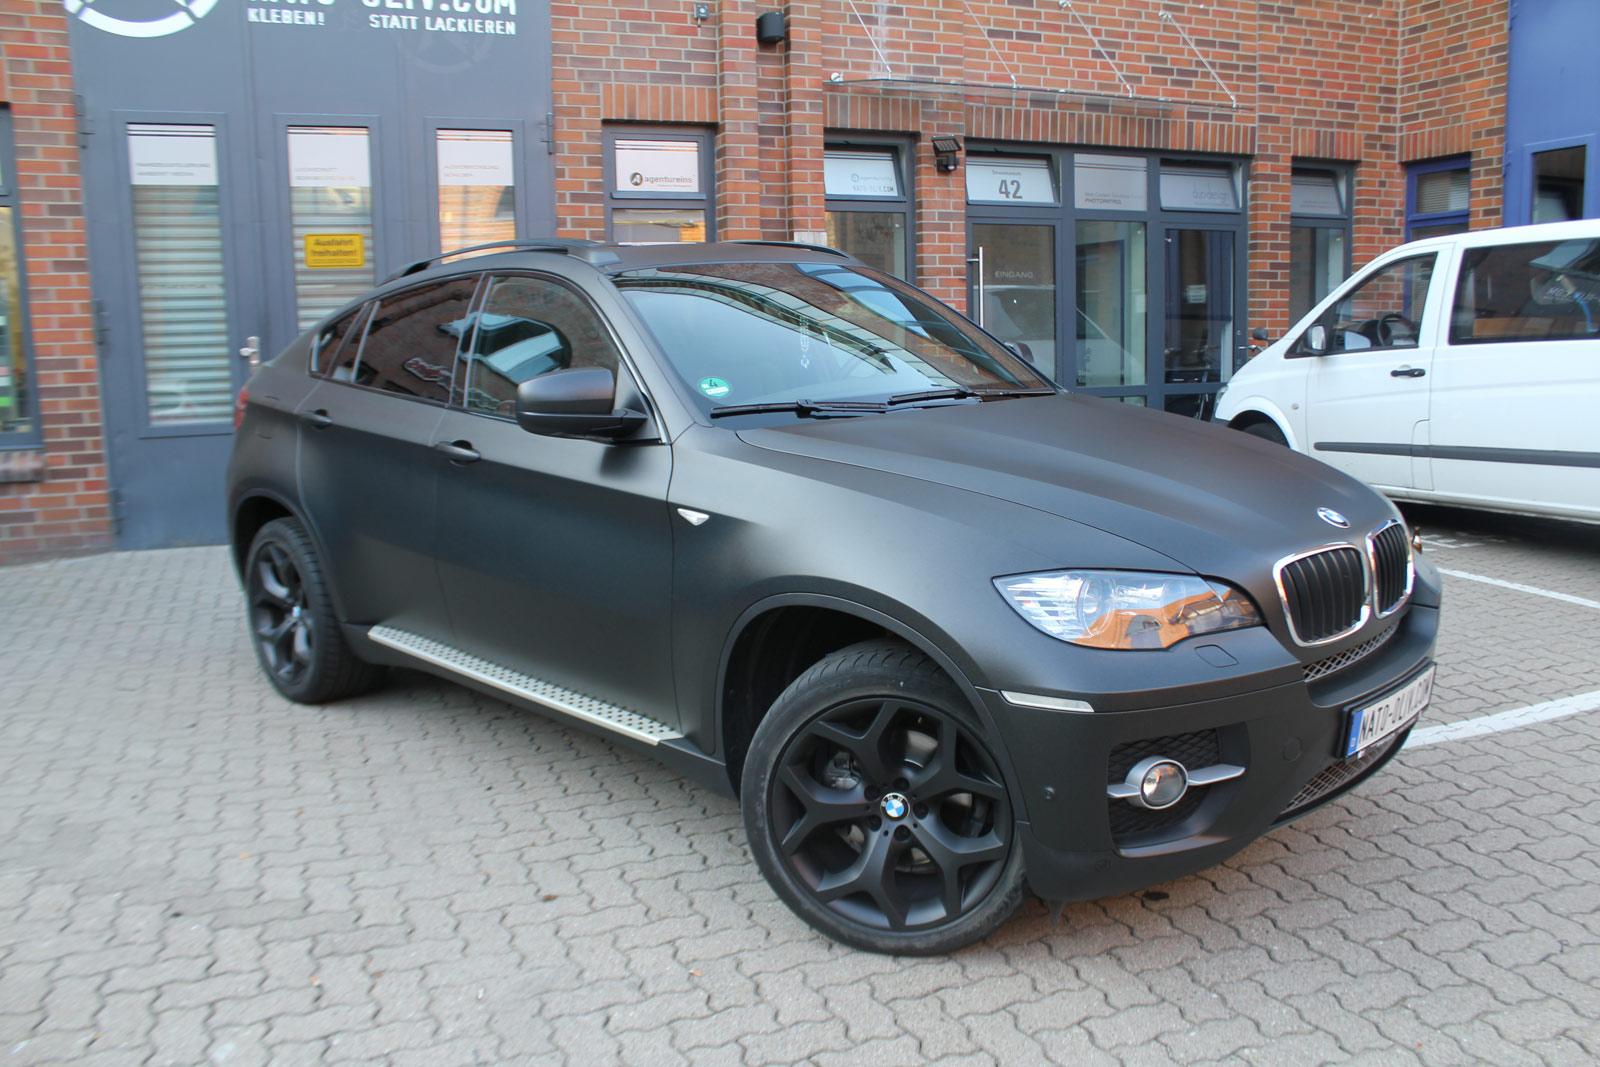 BMW_X6_FOLIERUNG_SCHWARZ_METALLIC_MATT_11